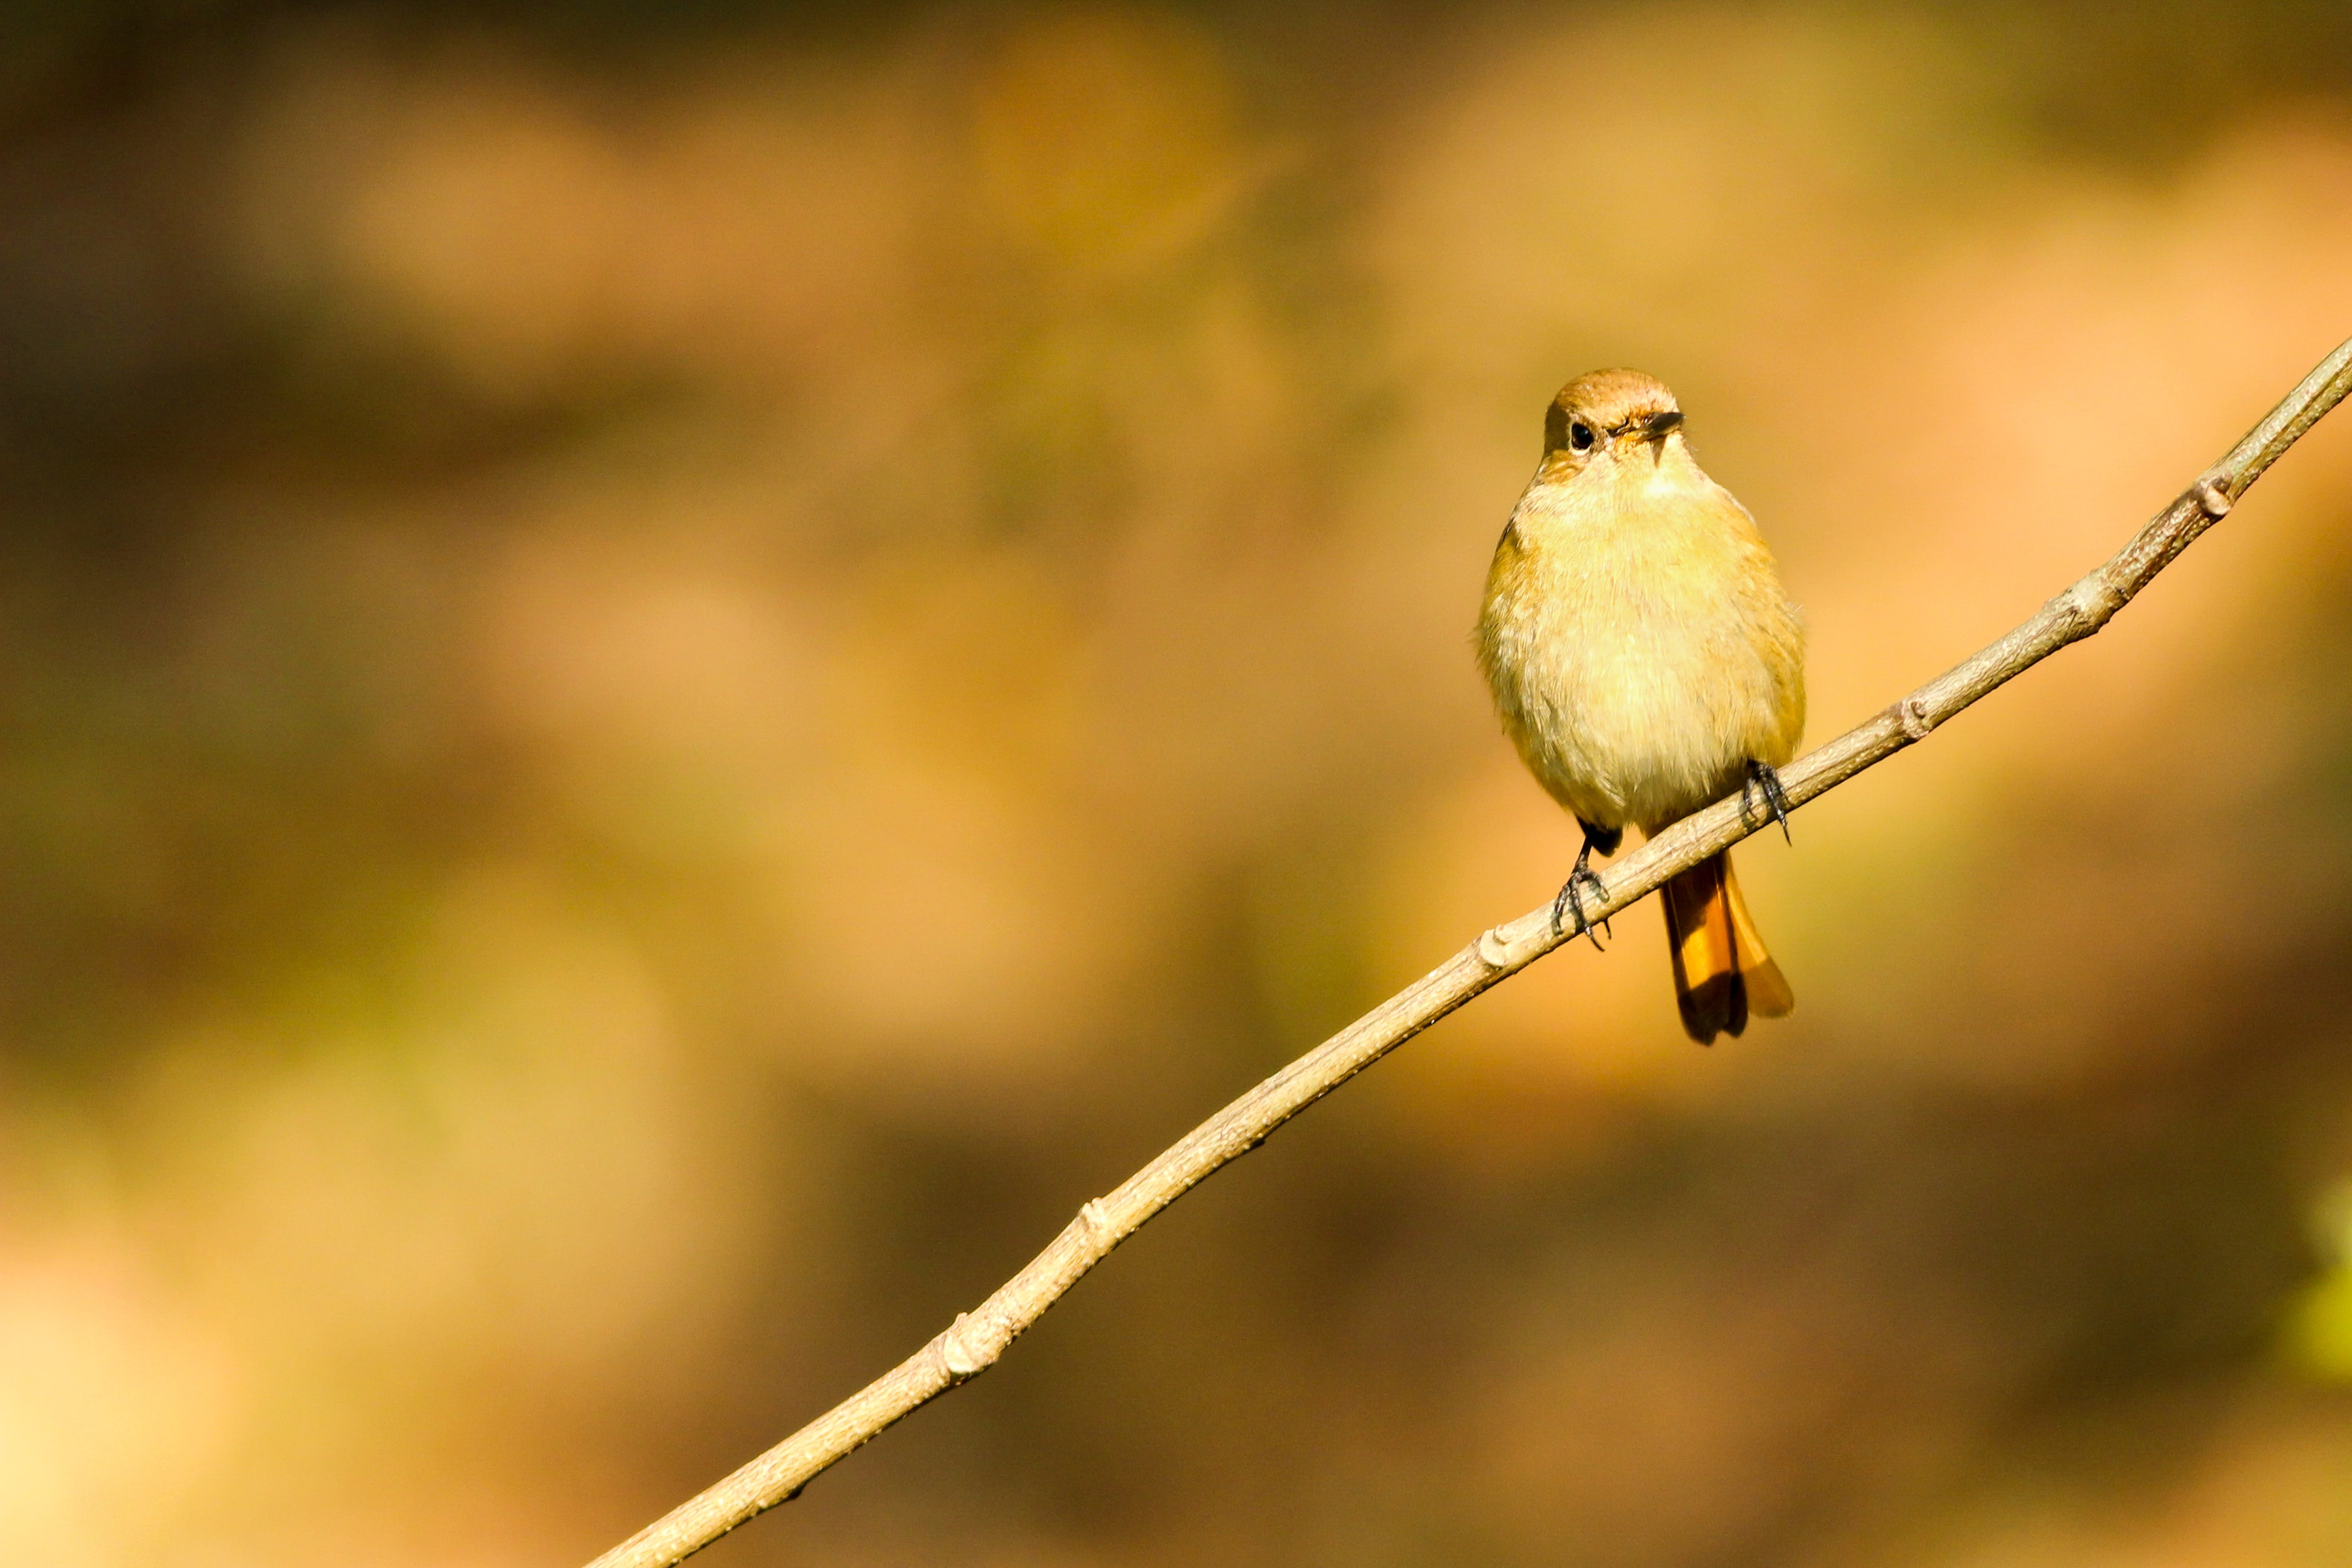 small brown short-beaked bird on brown twig